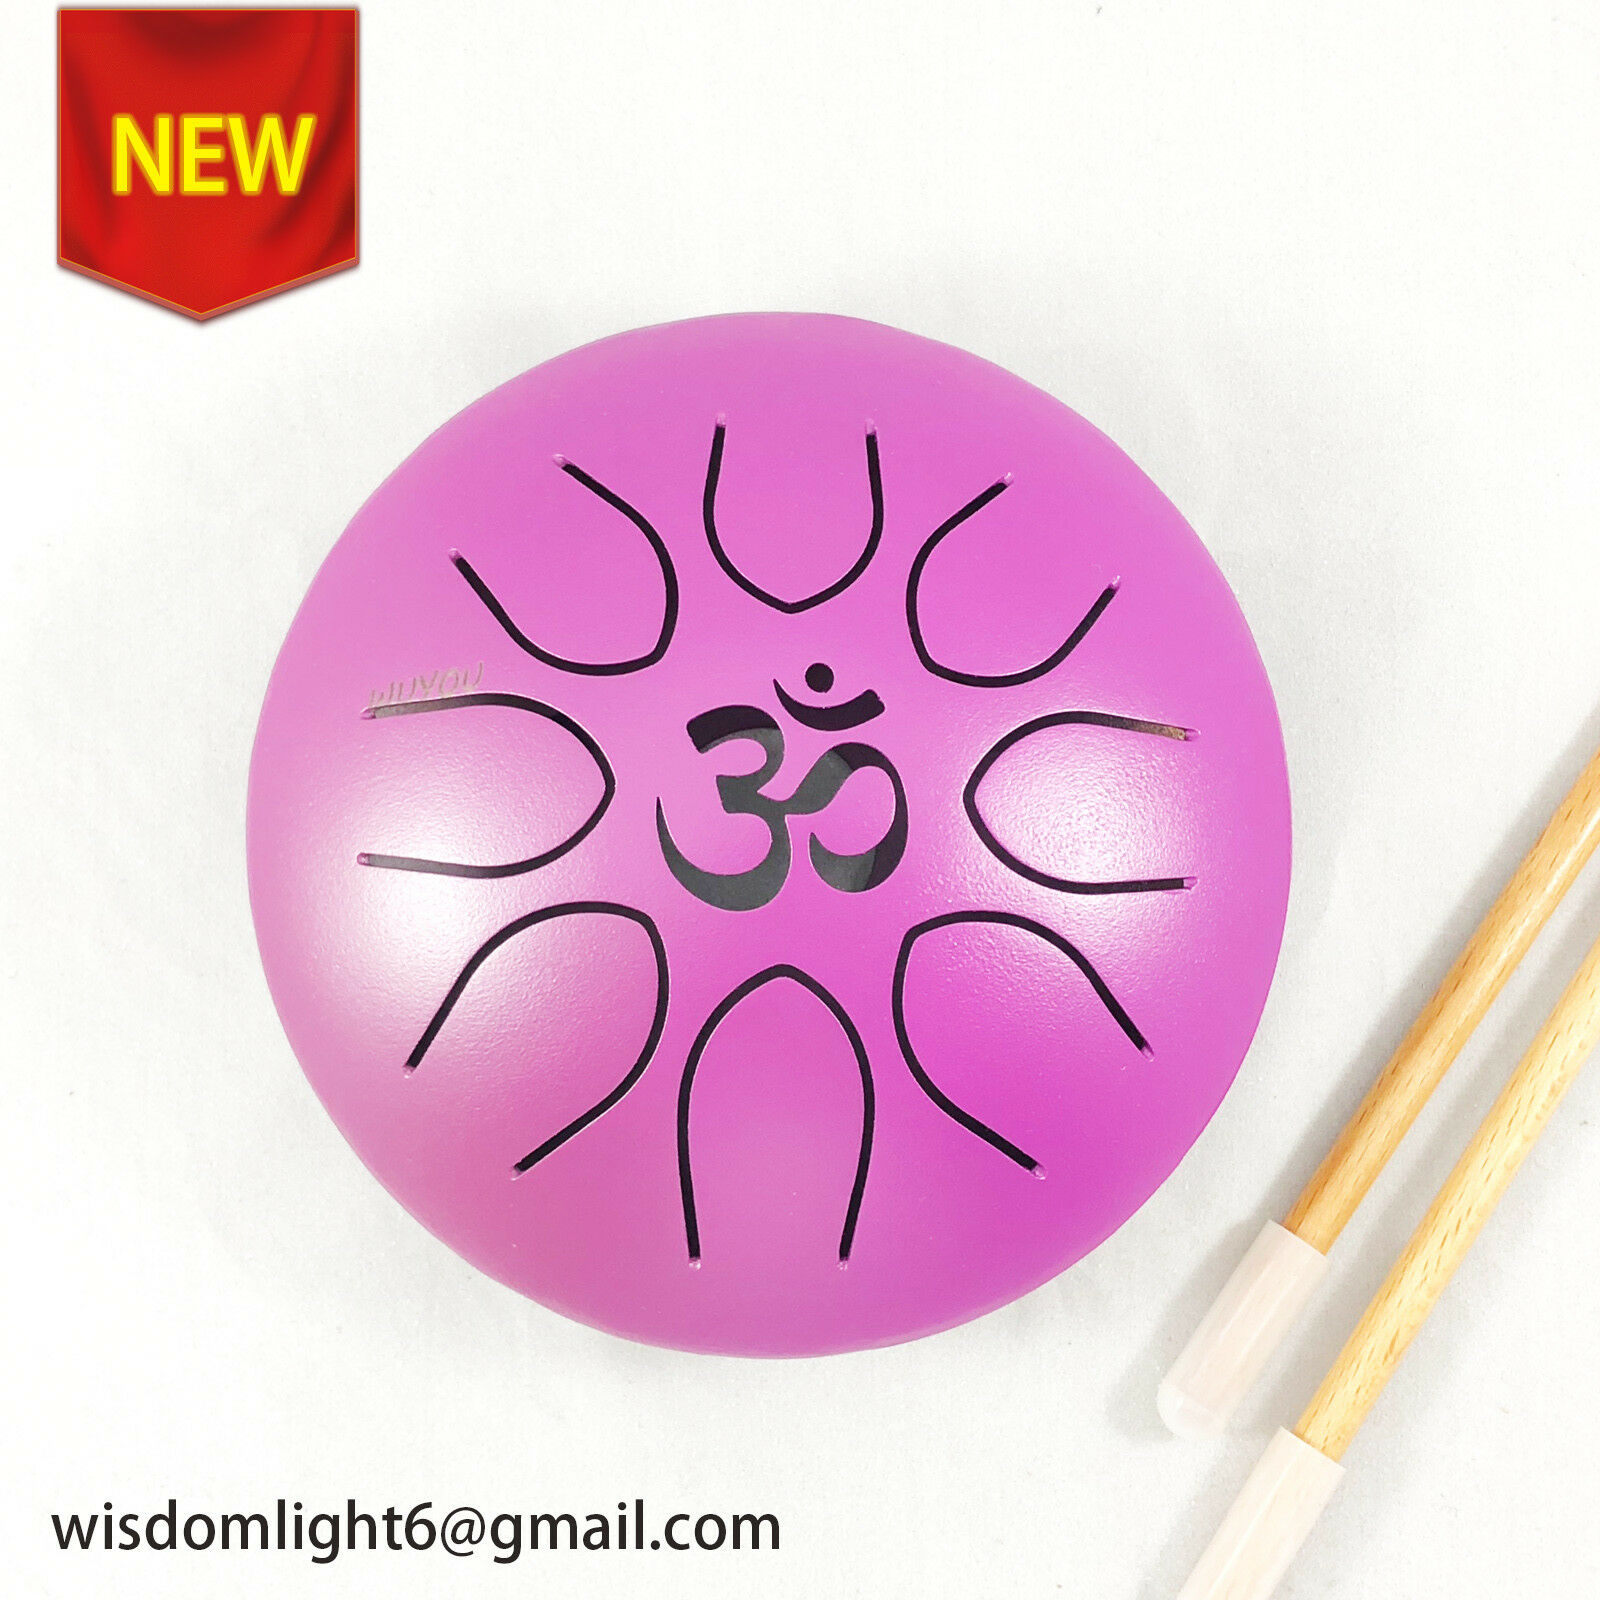 WuYou 7  16cm Steel Tongue Drum Handpan TankHank 8 Tones - Chakra Meditation